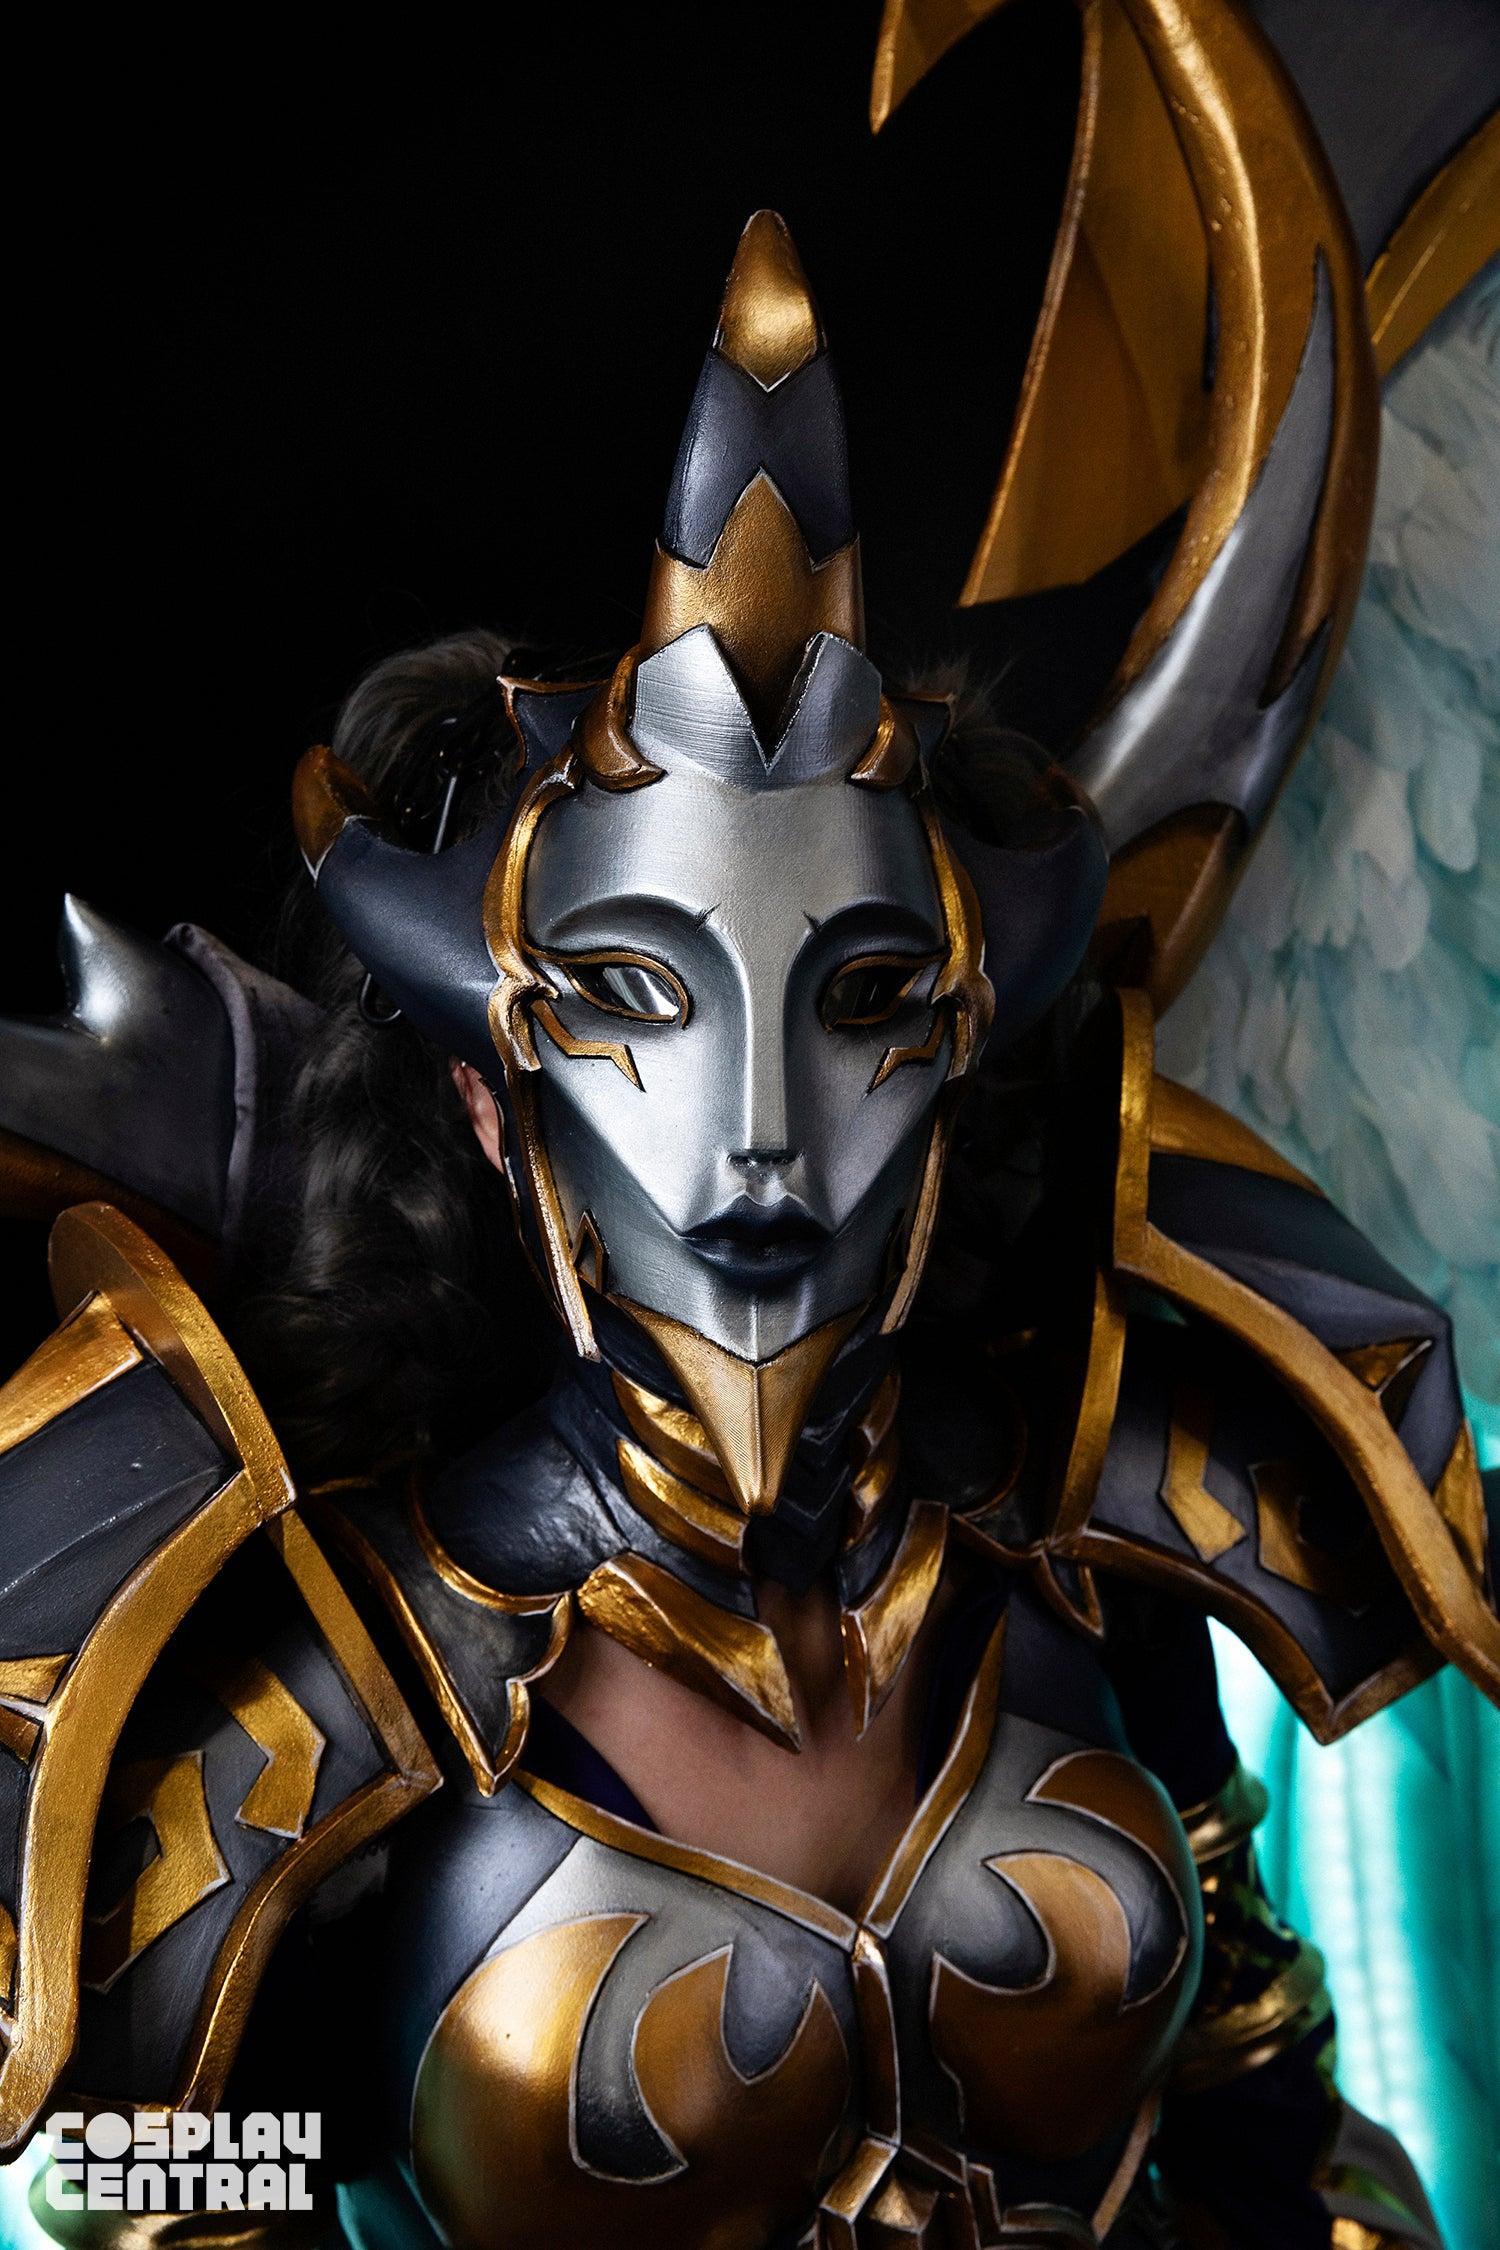 Pride Cosplay from Darksiders 3 (Plexi Cosplay)